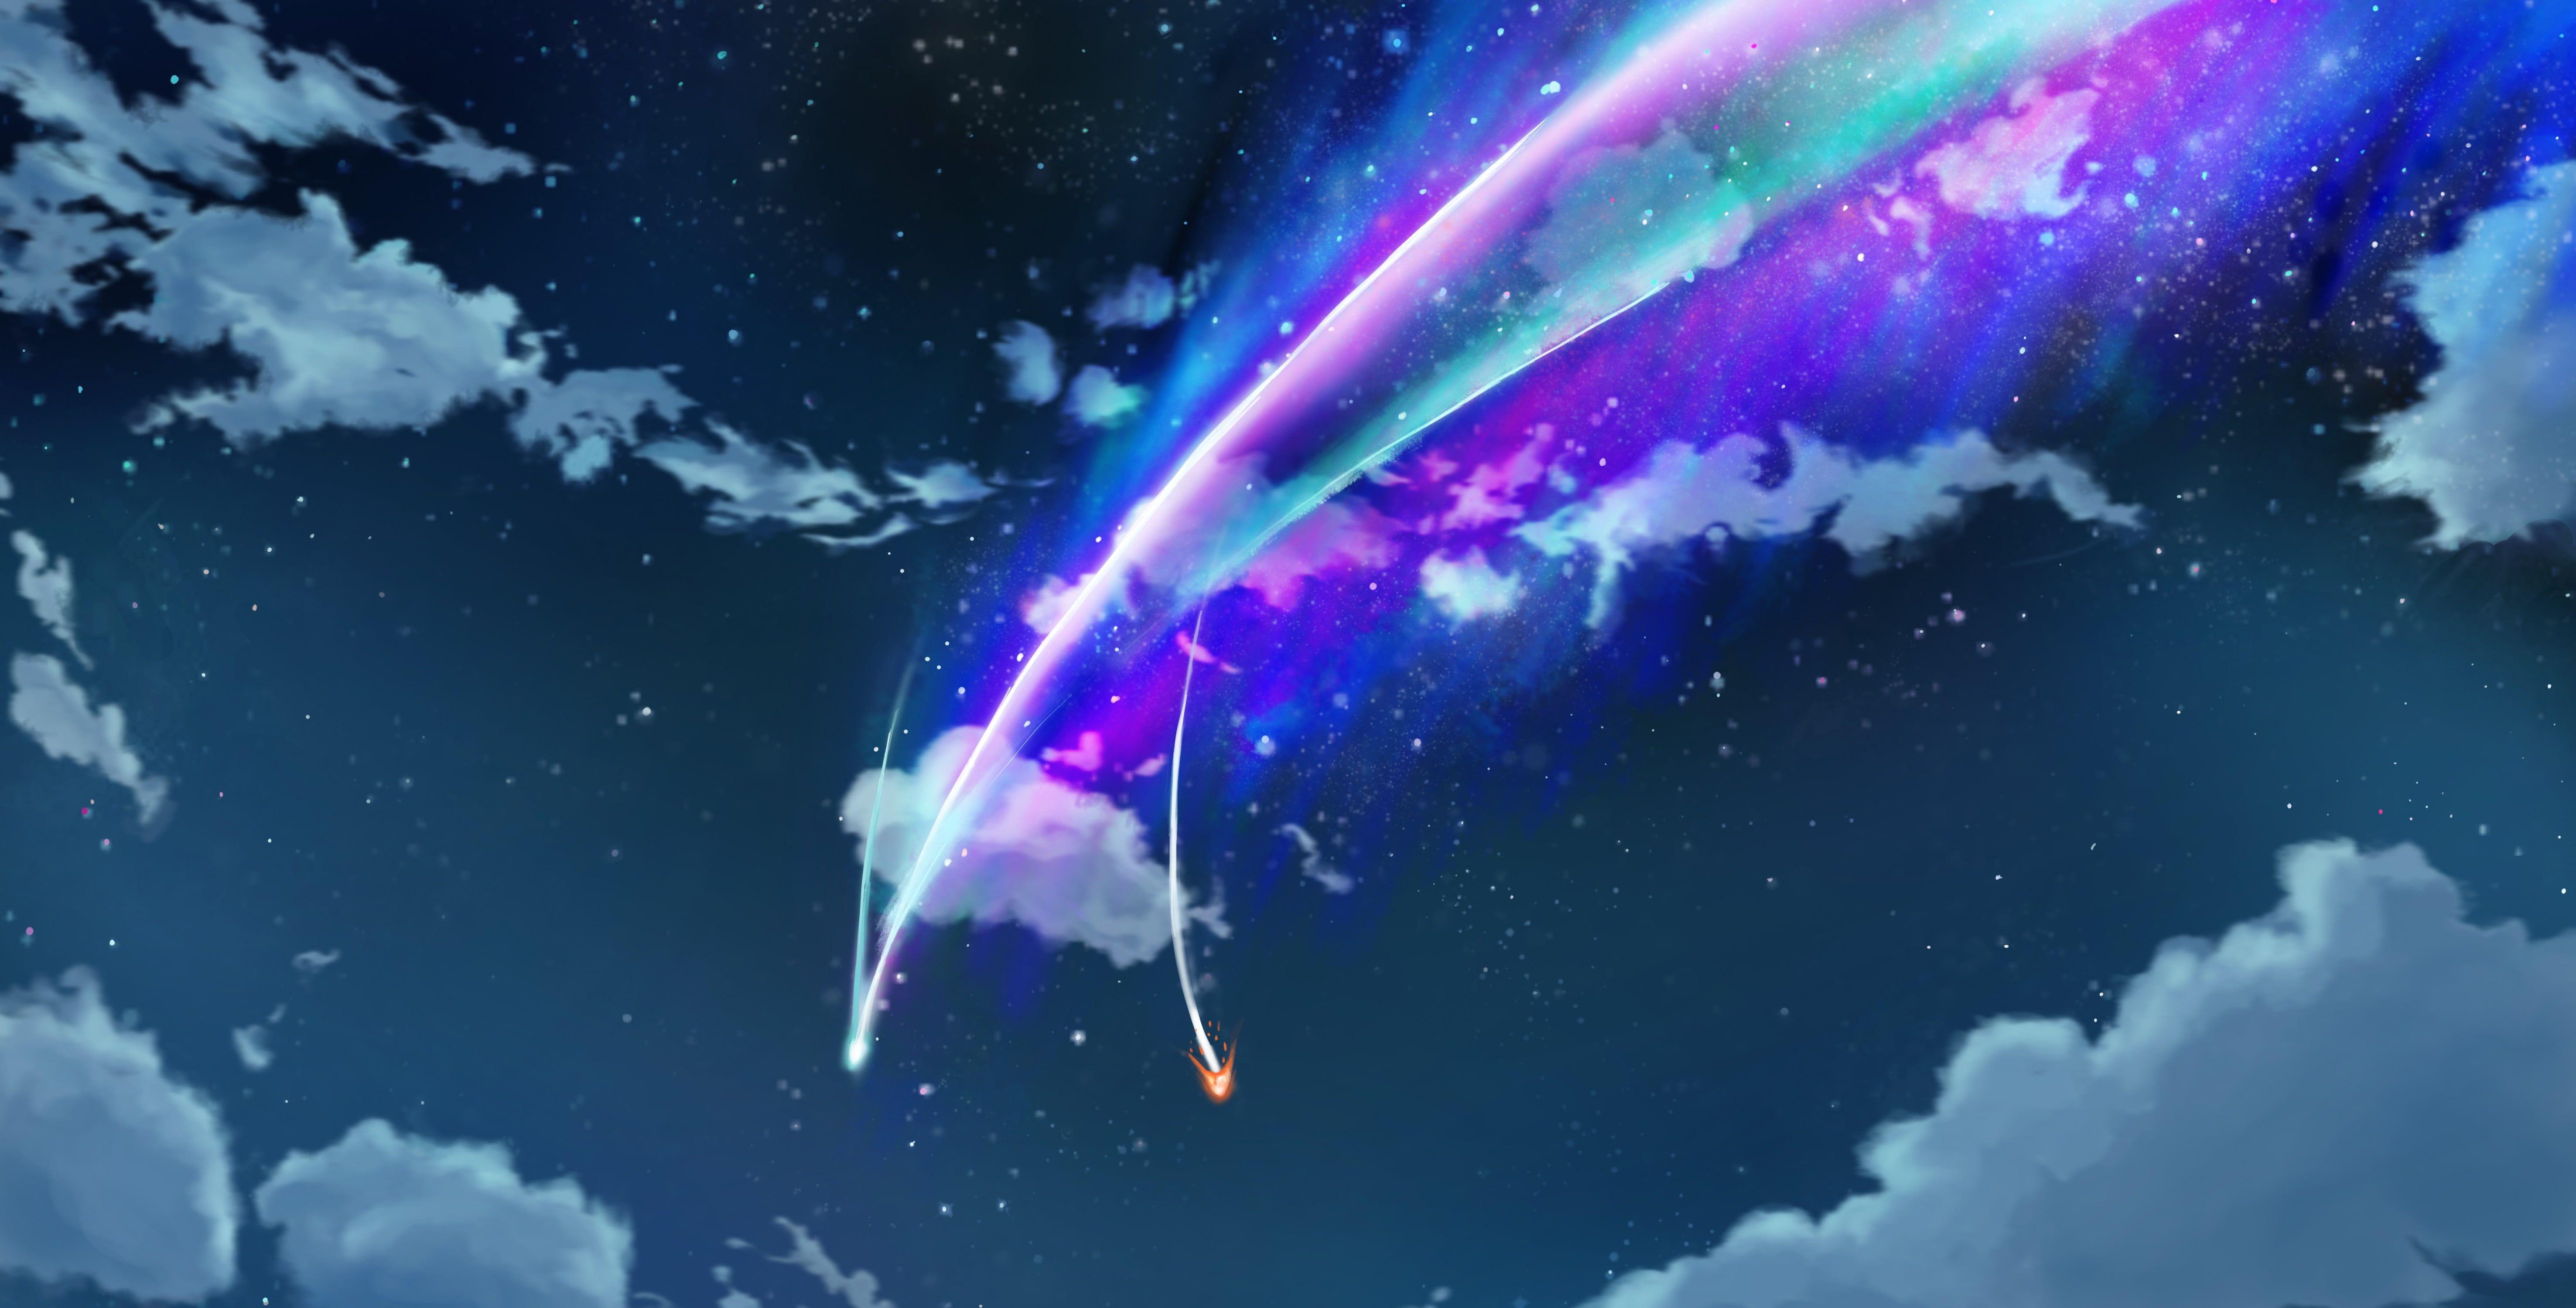 Hd wallpaper sky kimi no na wa wallpaper flare. Anime 4k Ultra Hd Wallpaper Kimi No Nawa - Animeindo